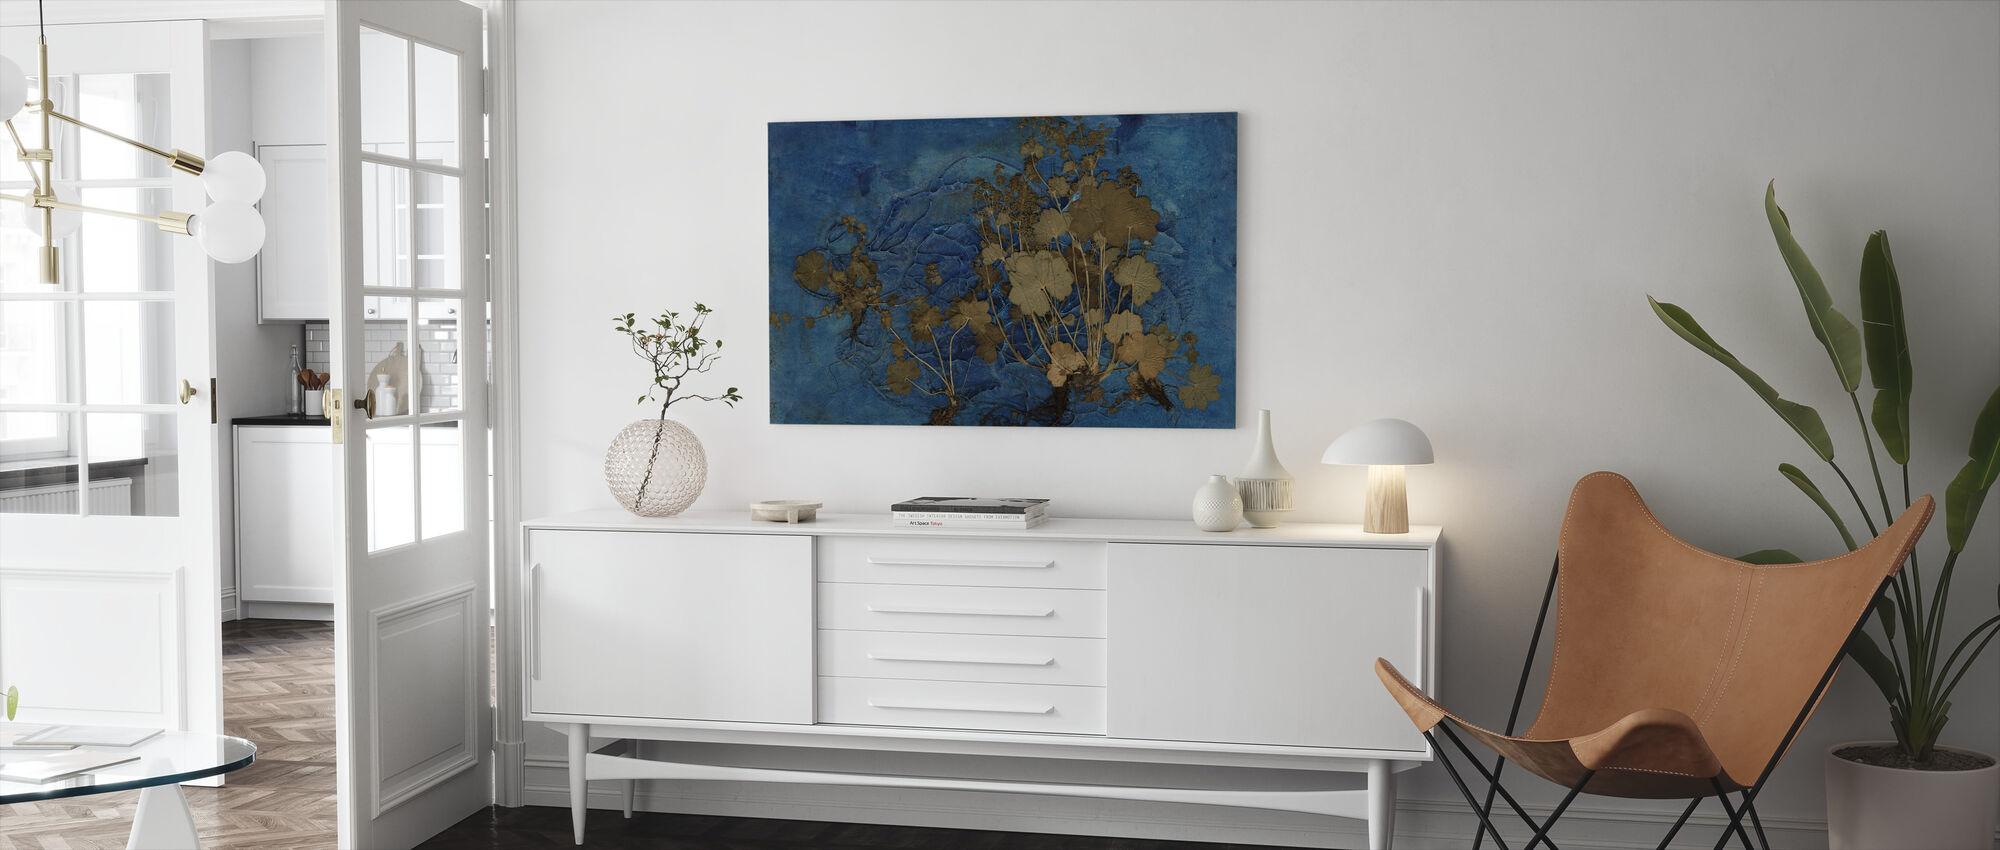 Alchemilla Vulgaris - Canvas print - Living Room